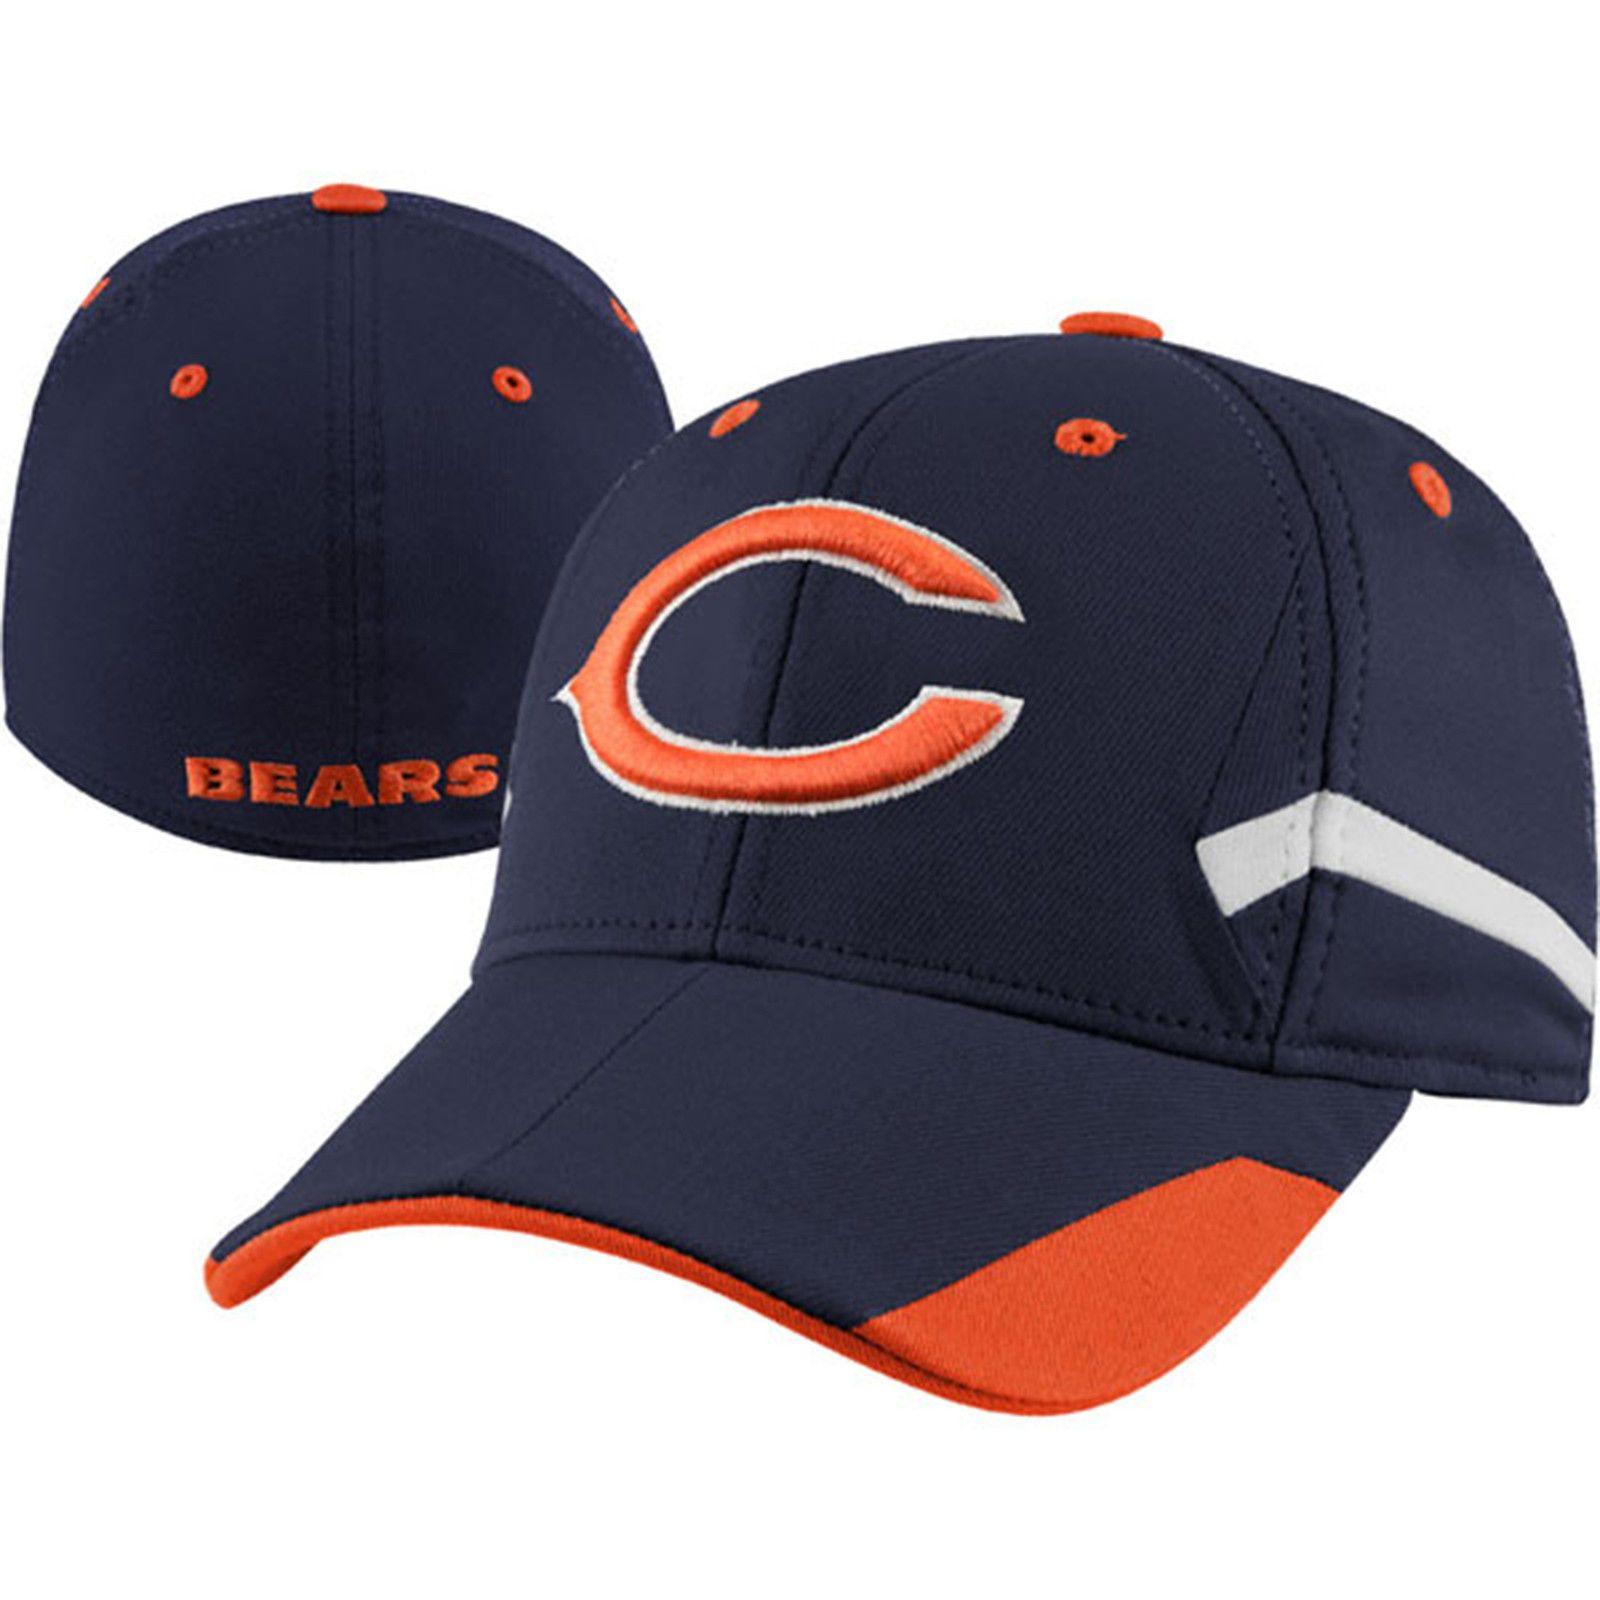 super popular e4341 2e226 Chicago Bears Youth Navy Flex Hat by Reebok | Sports World ...